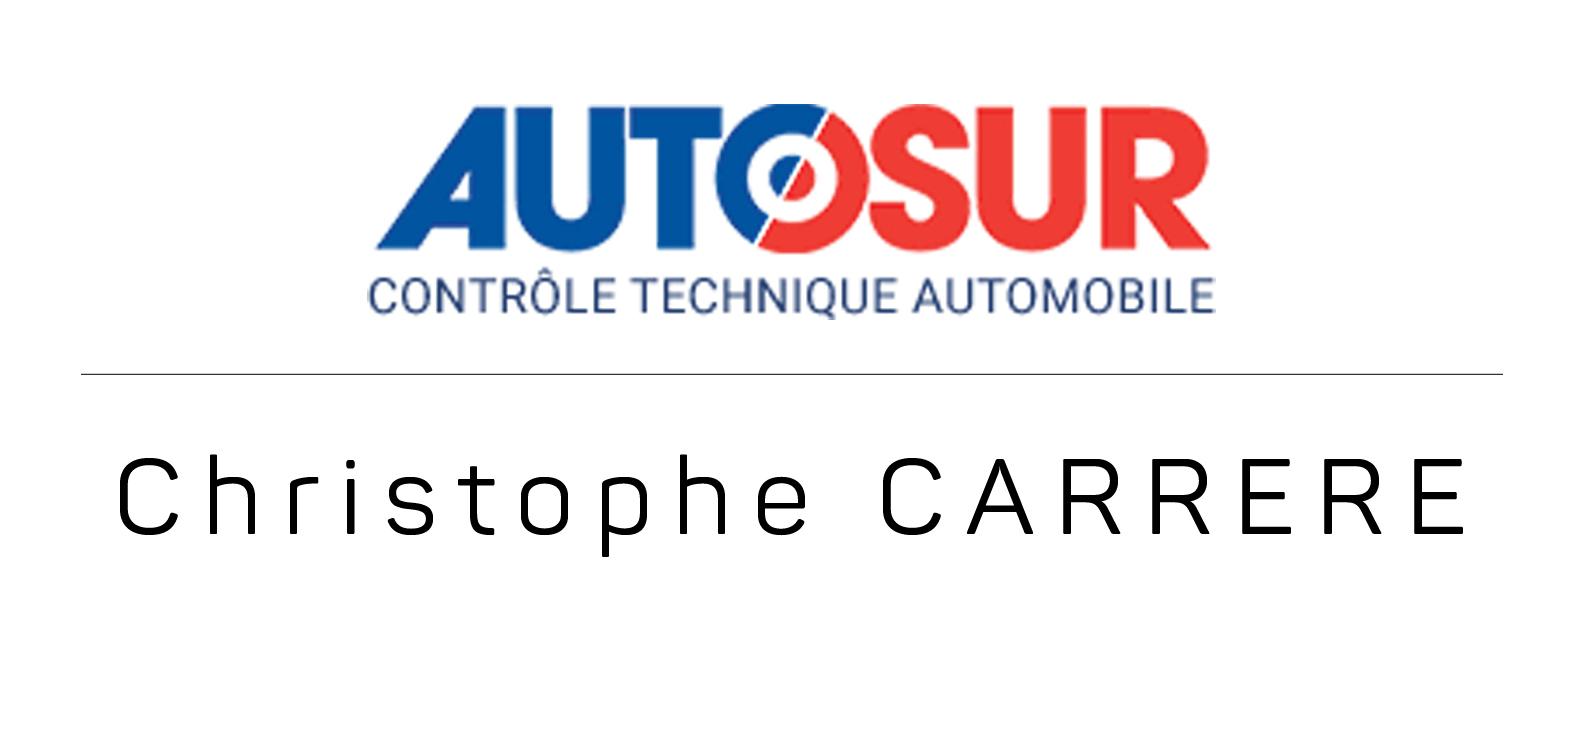 http://autosurcarrere.fr/wp-content/uploads/2017/12/logo.jpg